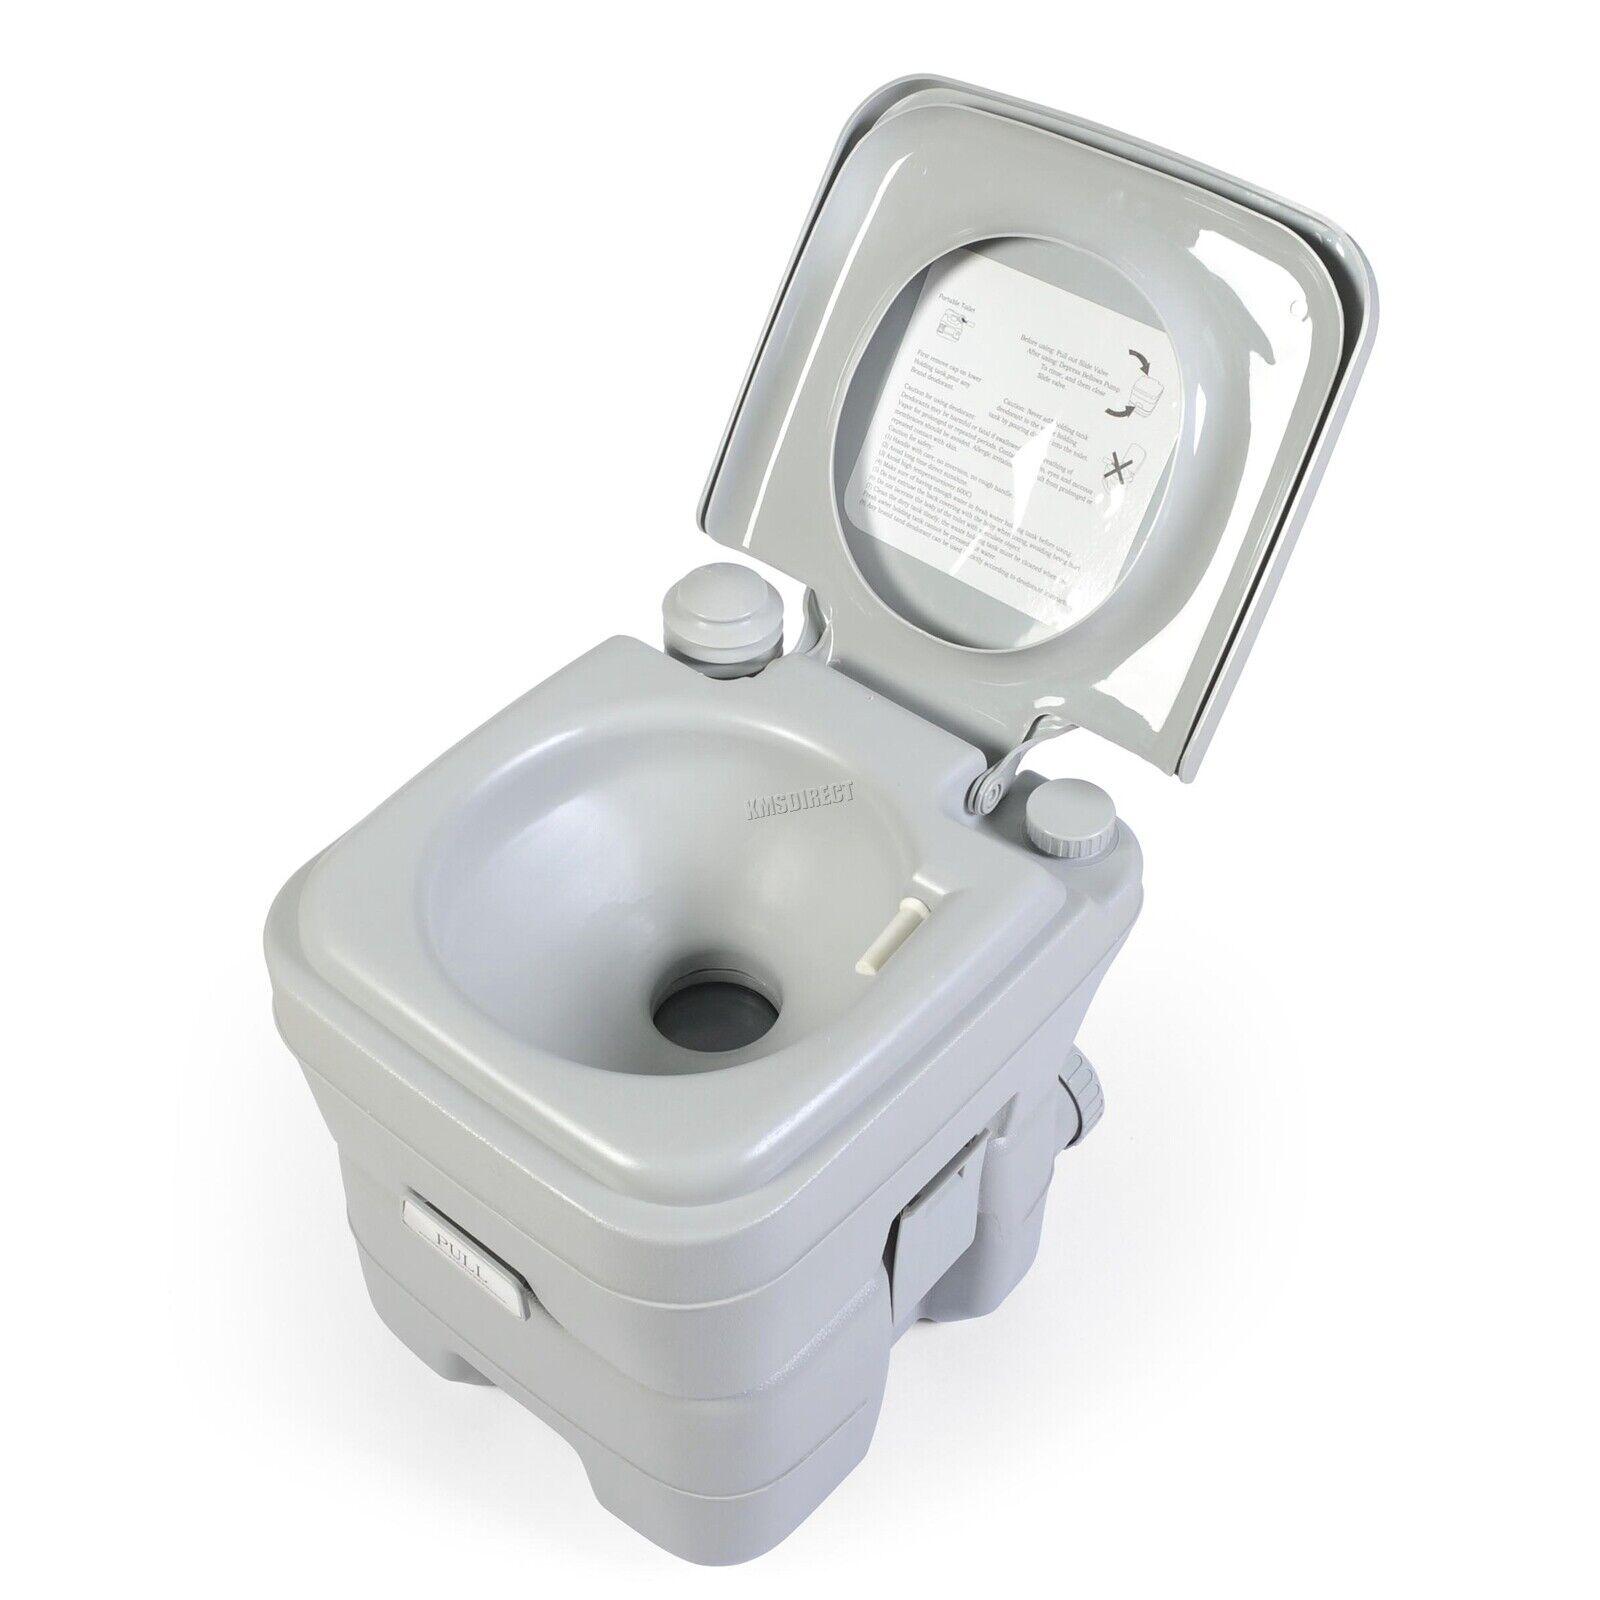 FoxHunter 20L Portable Toilet Flush Caravan Camping Travel WC Loo Porta Potty 6